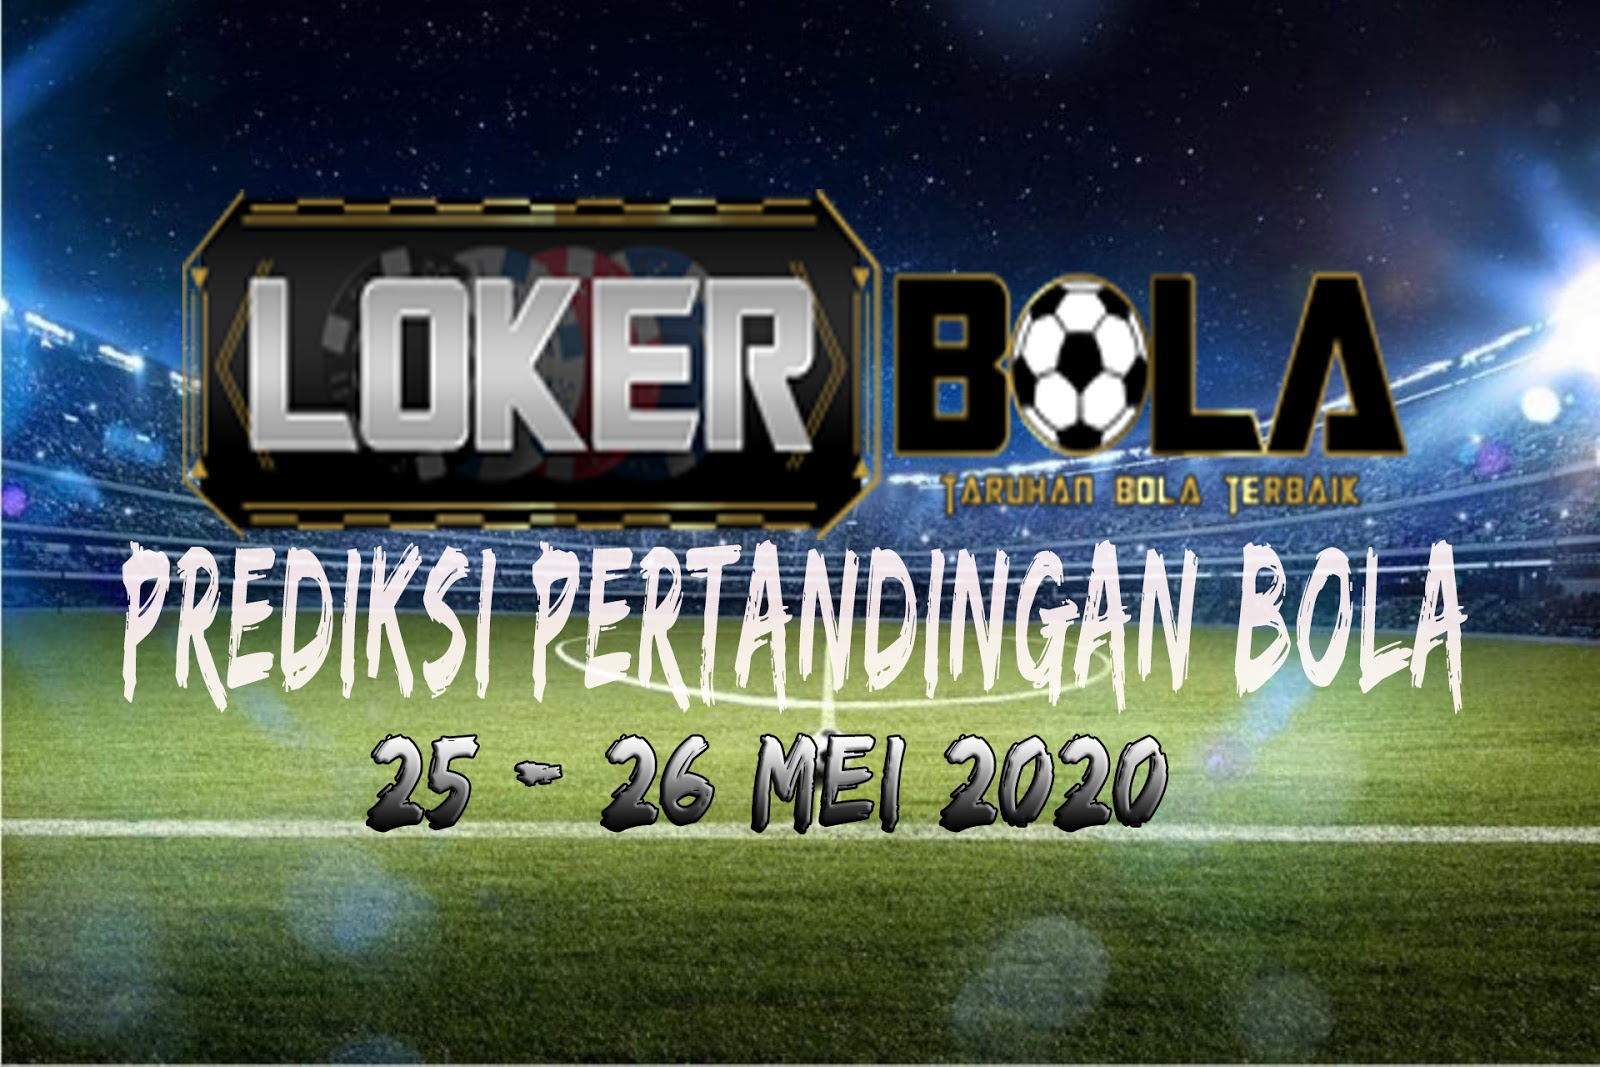 PREDIKSI PERTANDINGAN BOLA 25 – 26  May 2020